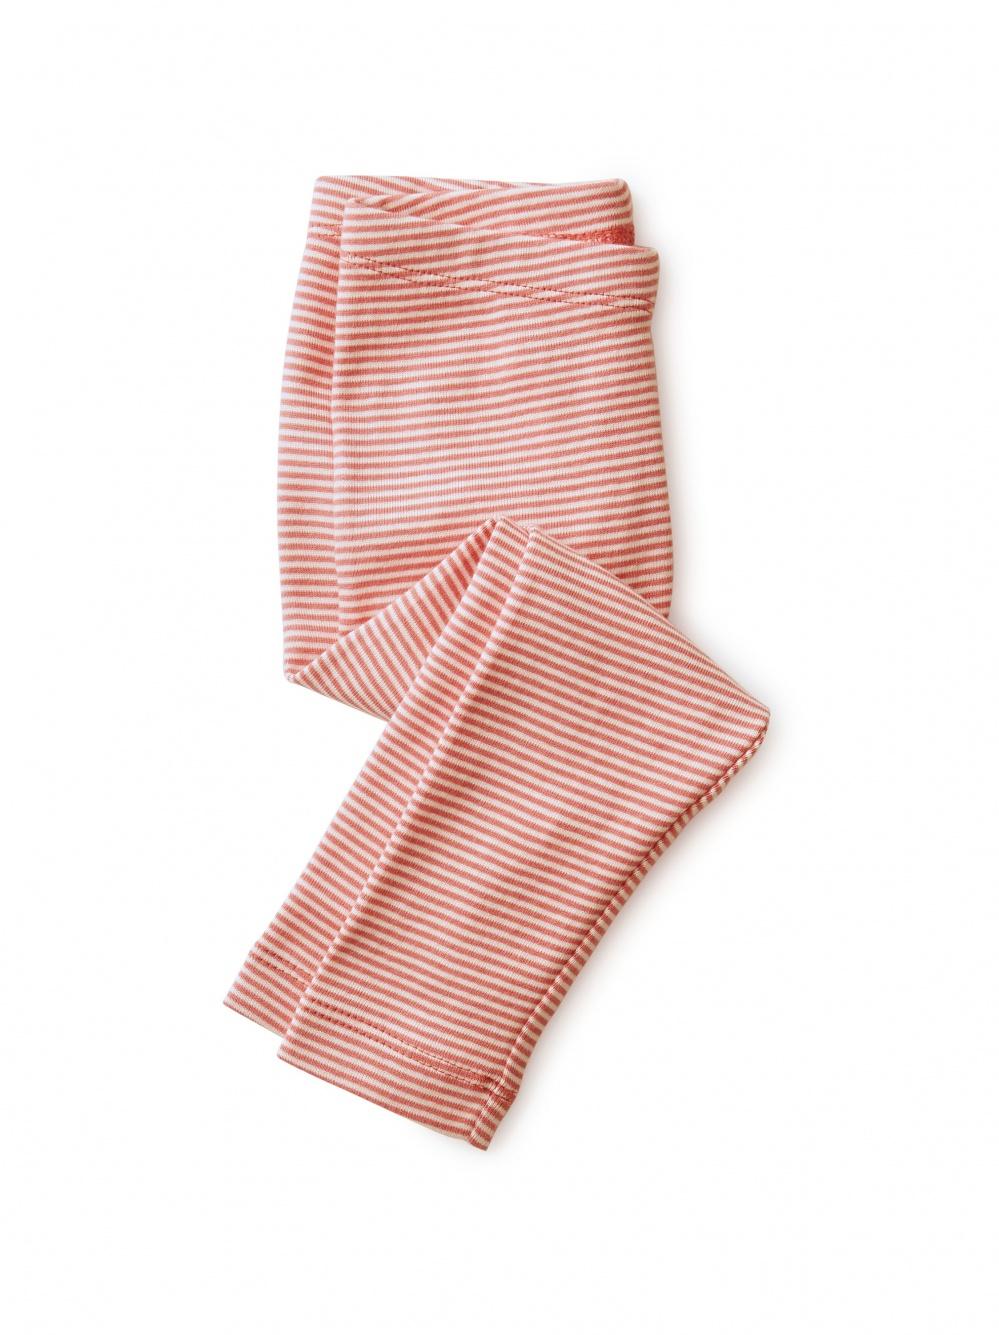 Striped Baby Leggings